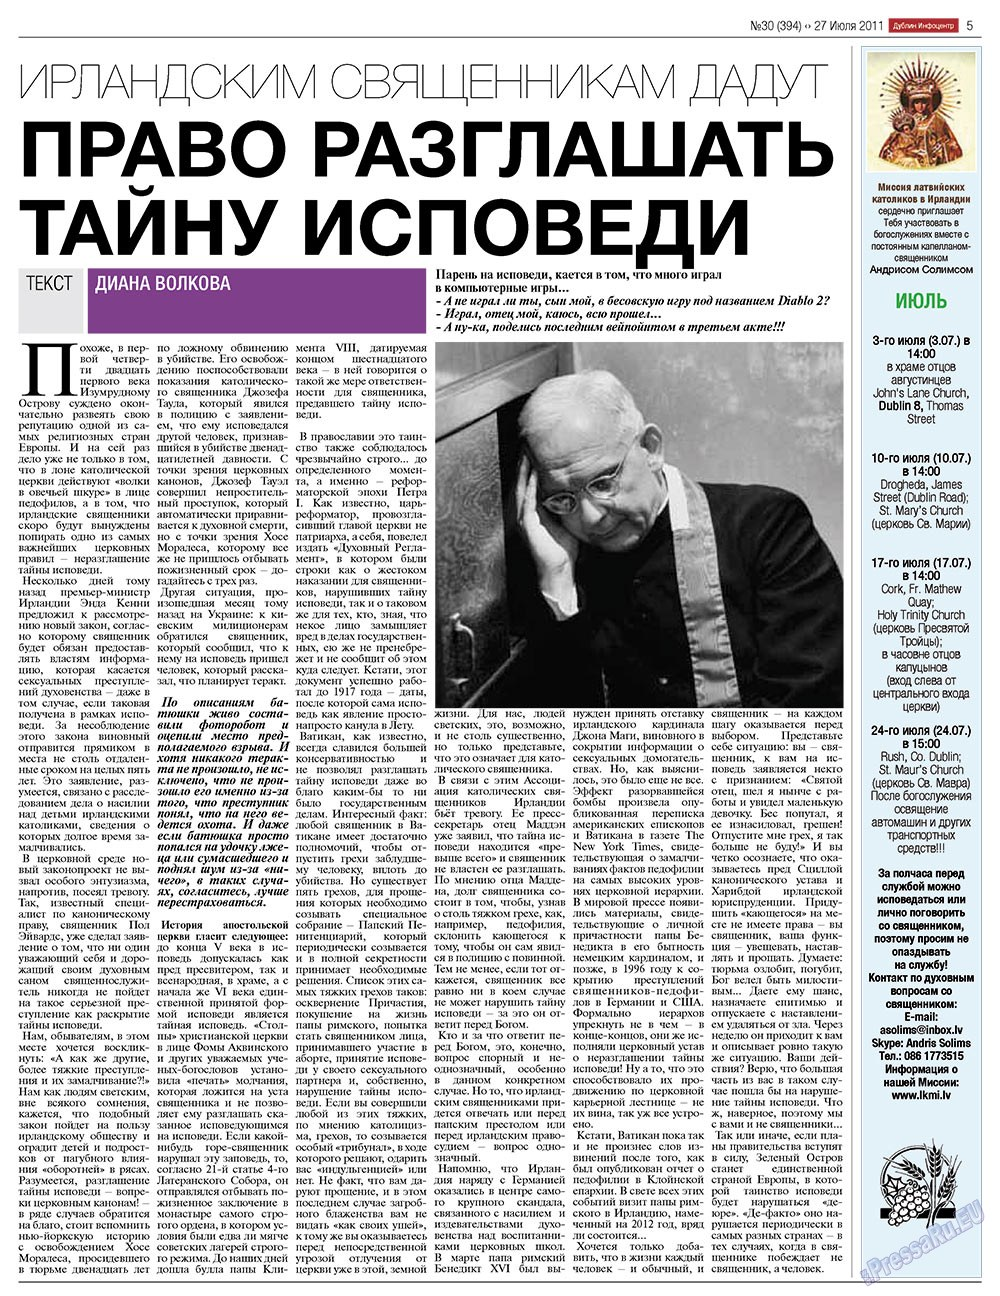 Дублин инфоцентр (газета). 2011 год, номер 30, стр. 5